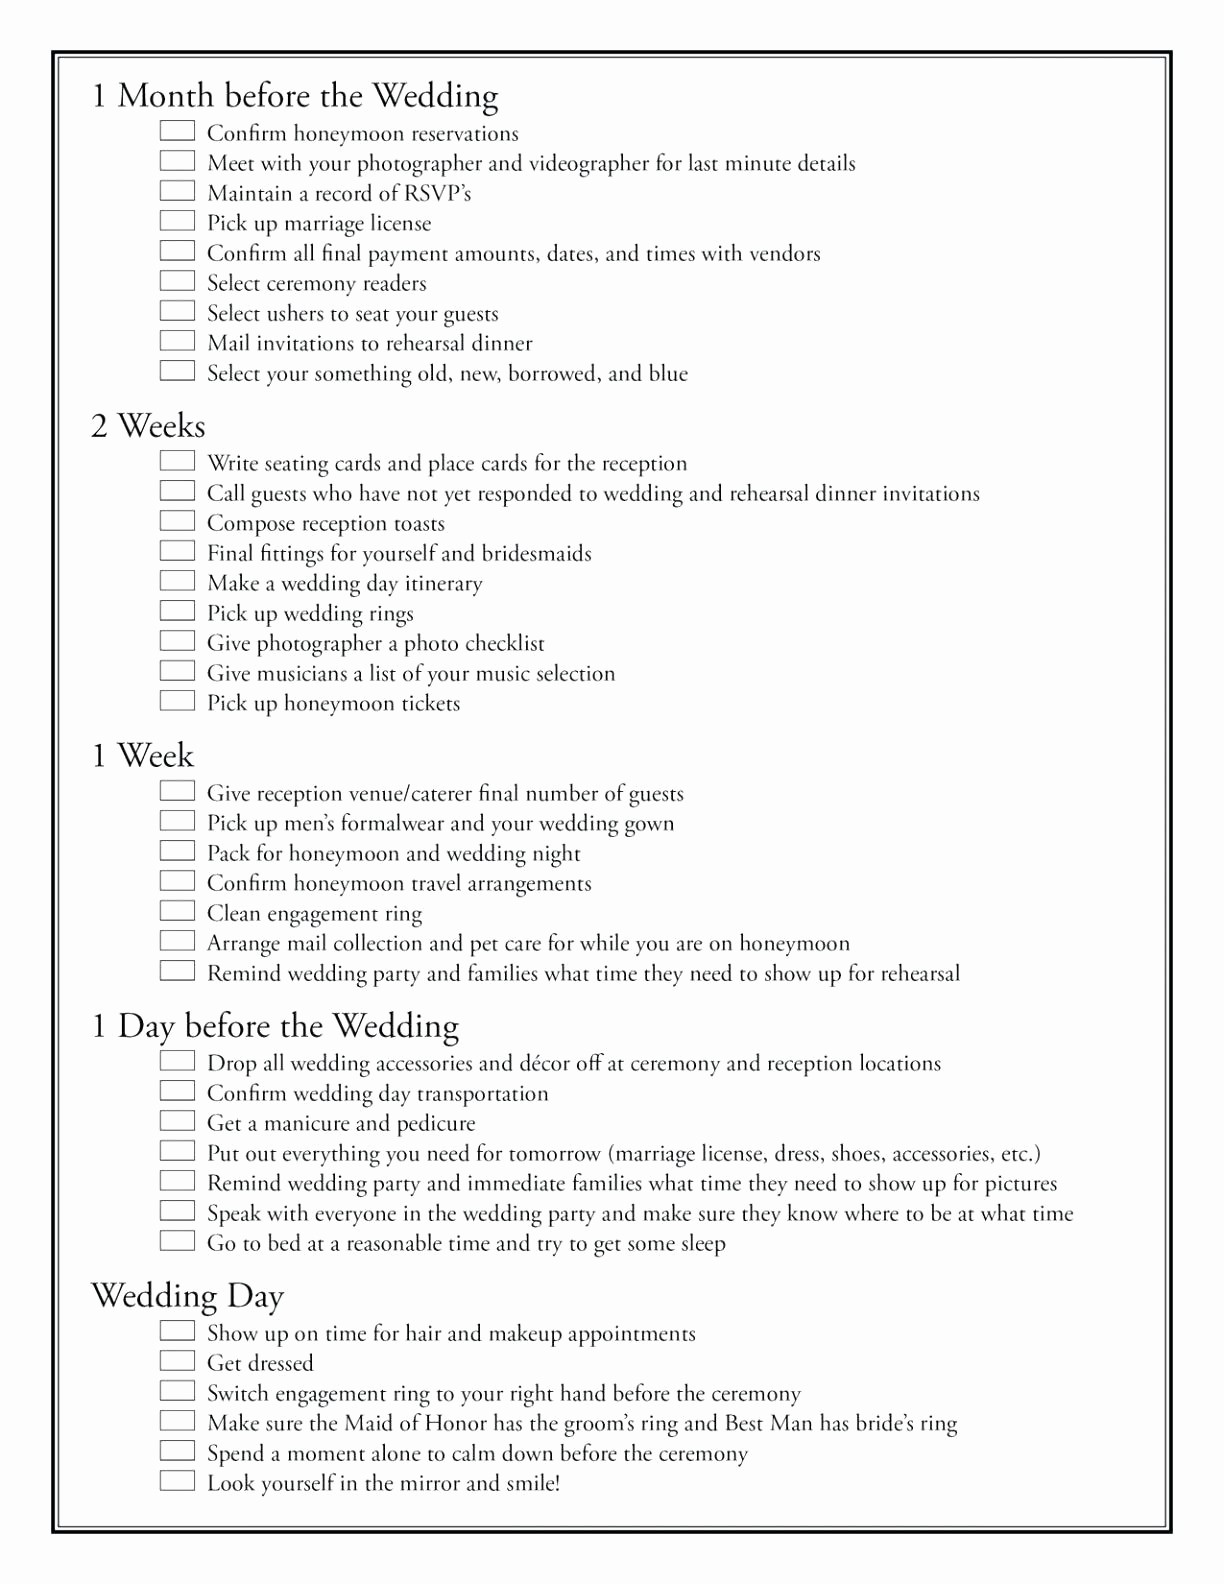 Wedding Ceremony song List Template Luxury Wedding Ceremony song List Template Niedlich Wedding